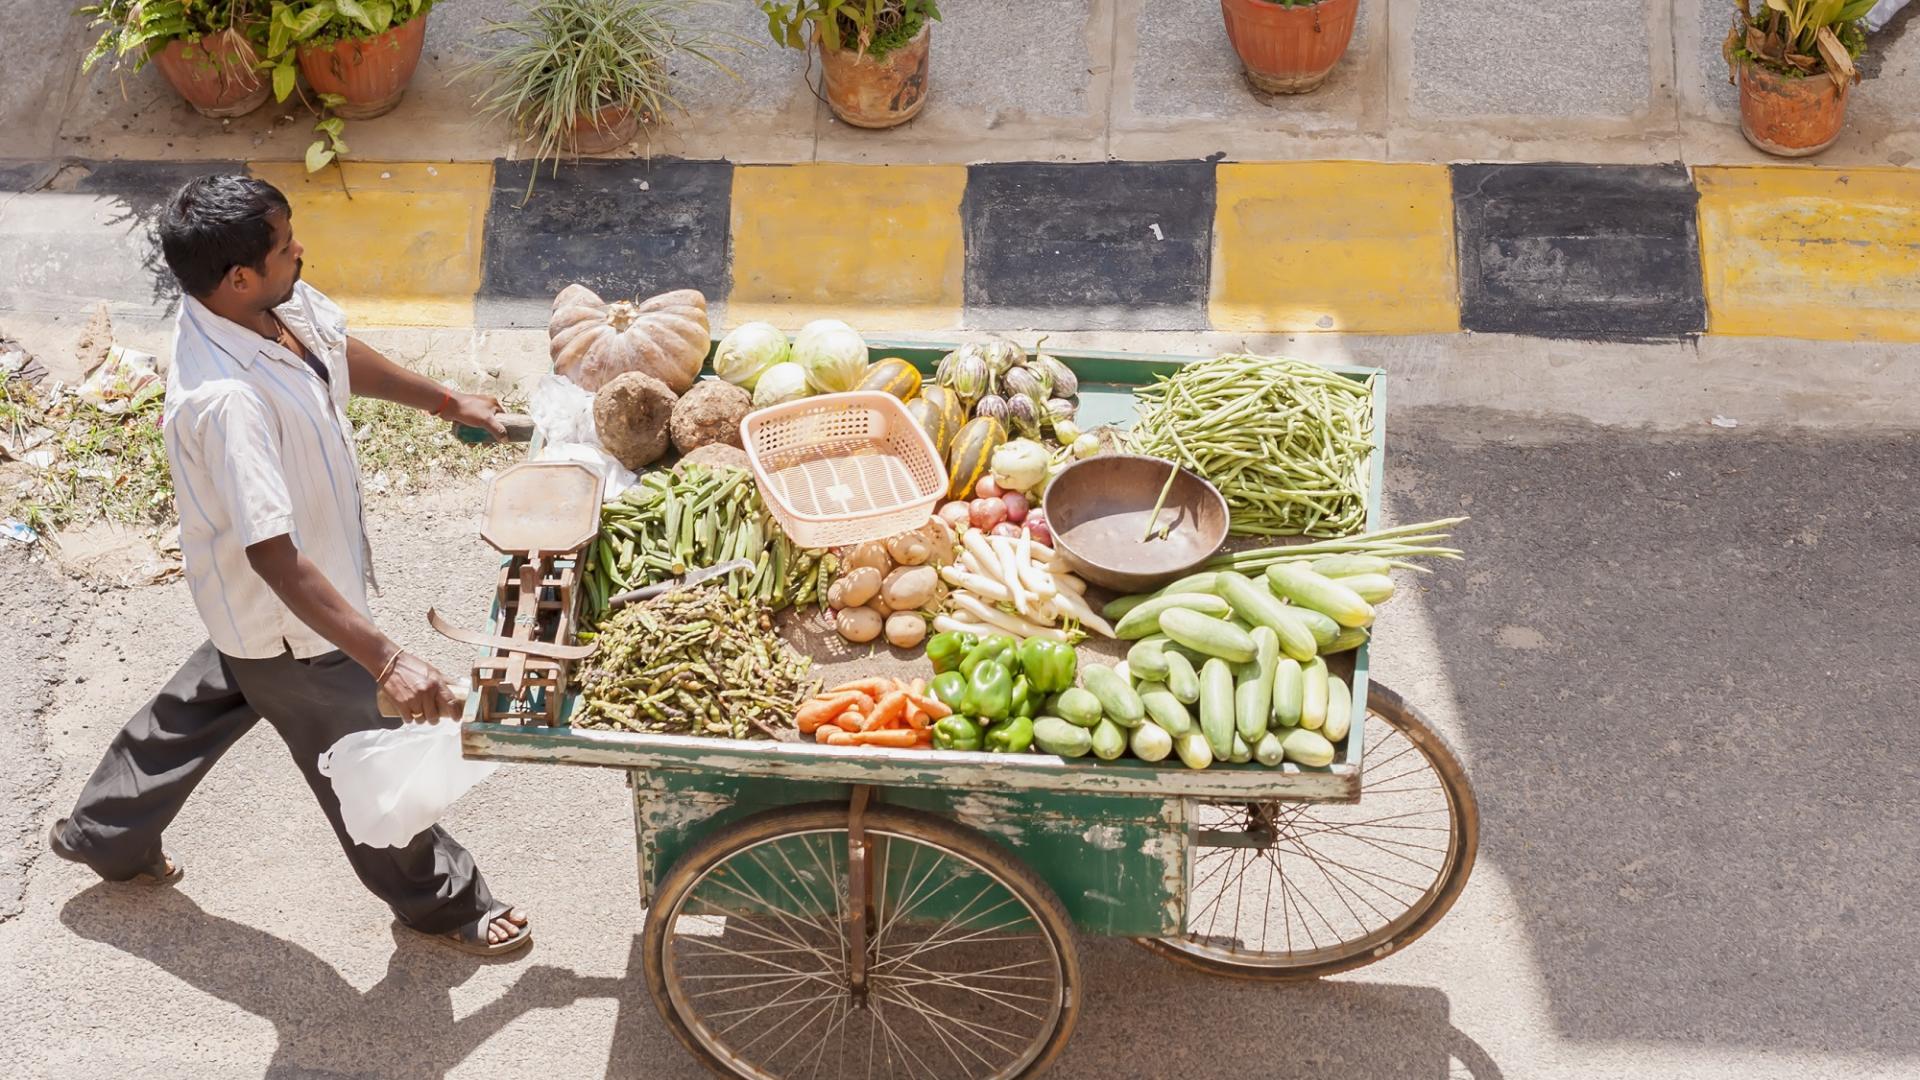 Mann Gemüse Wagen